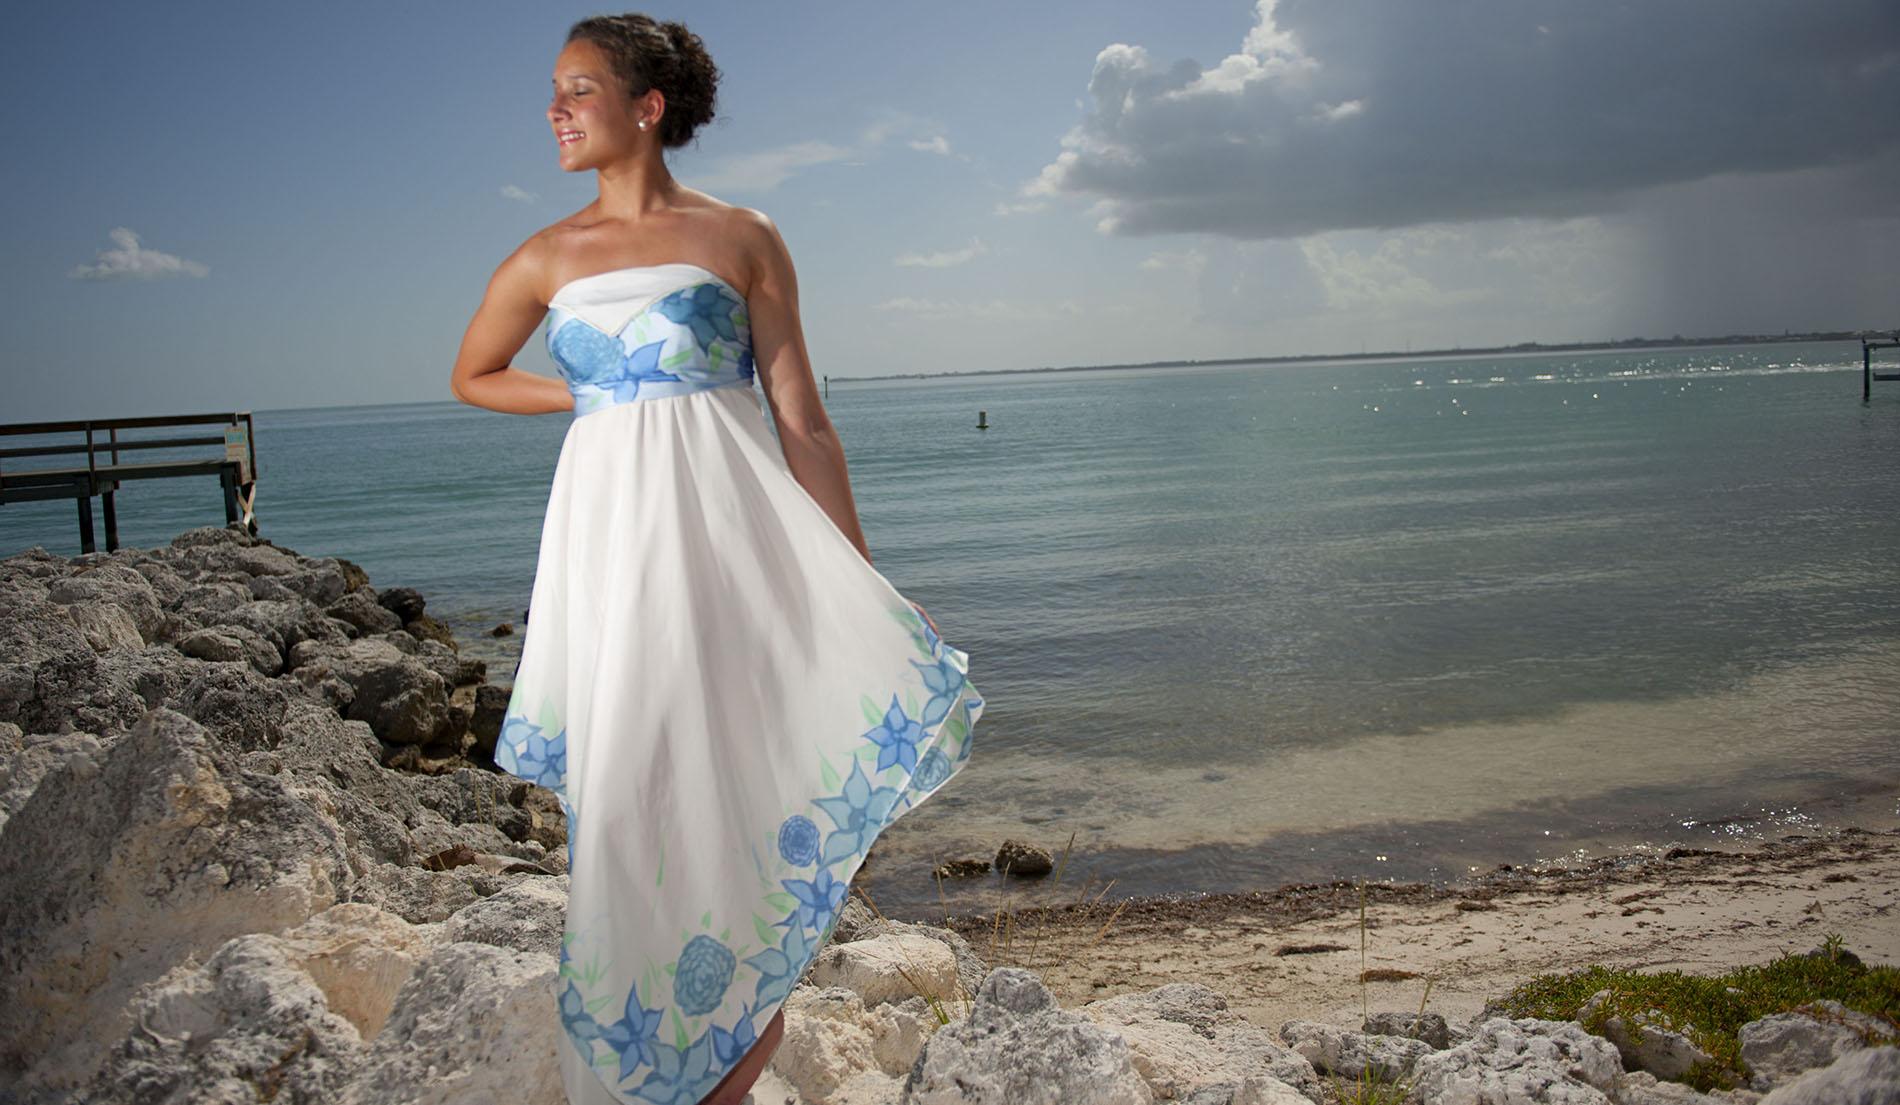 Beach Wedding Dress For Second Time Bride Train & Veil